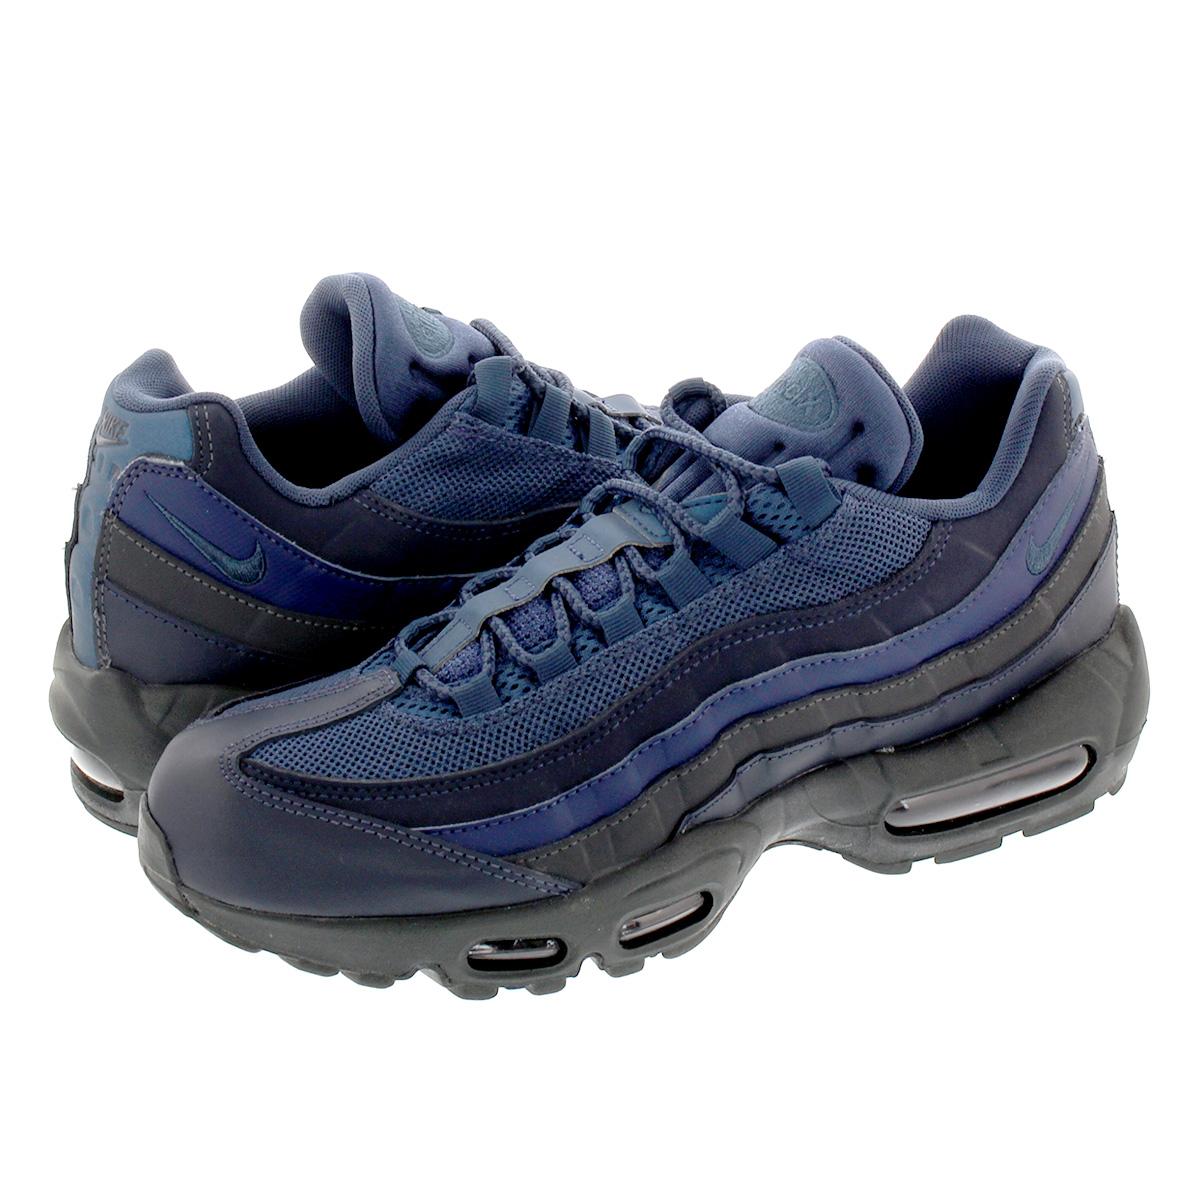 Nike Air Max 95 Essential Squadron Blue Squadron Blue, Mens